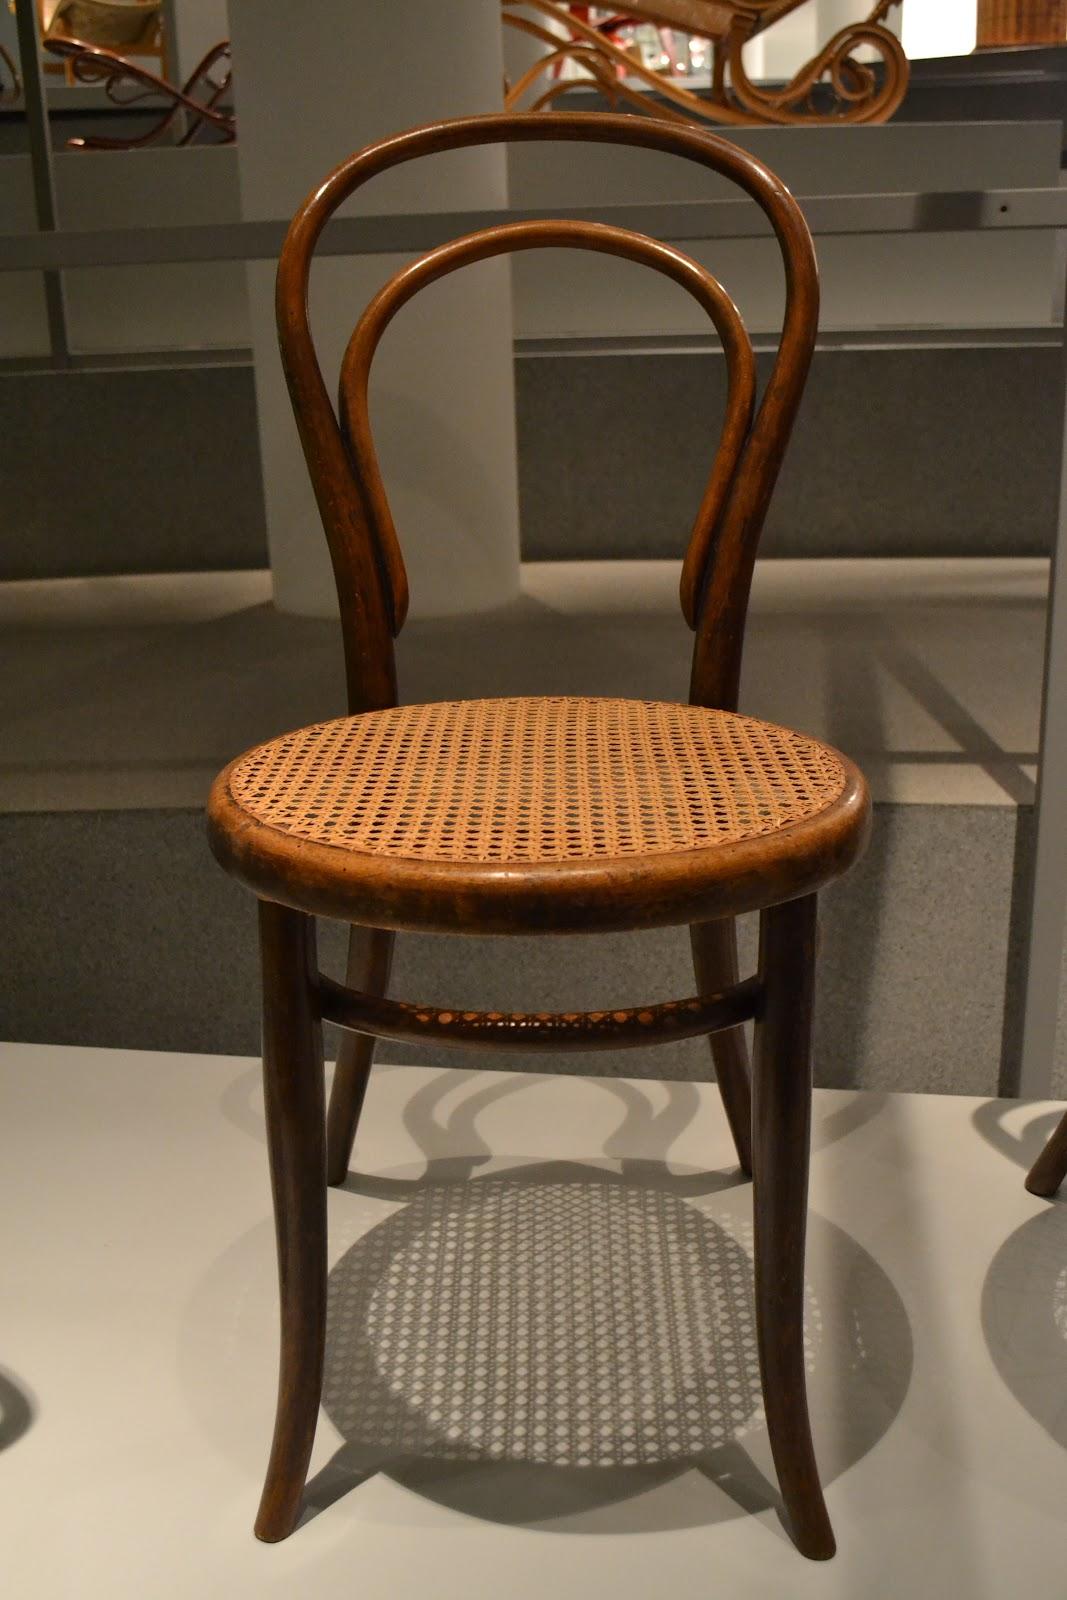 THONET Chair #14, U201cVienna Coffee House Chair,u0027 1859